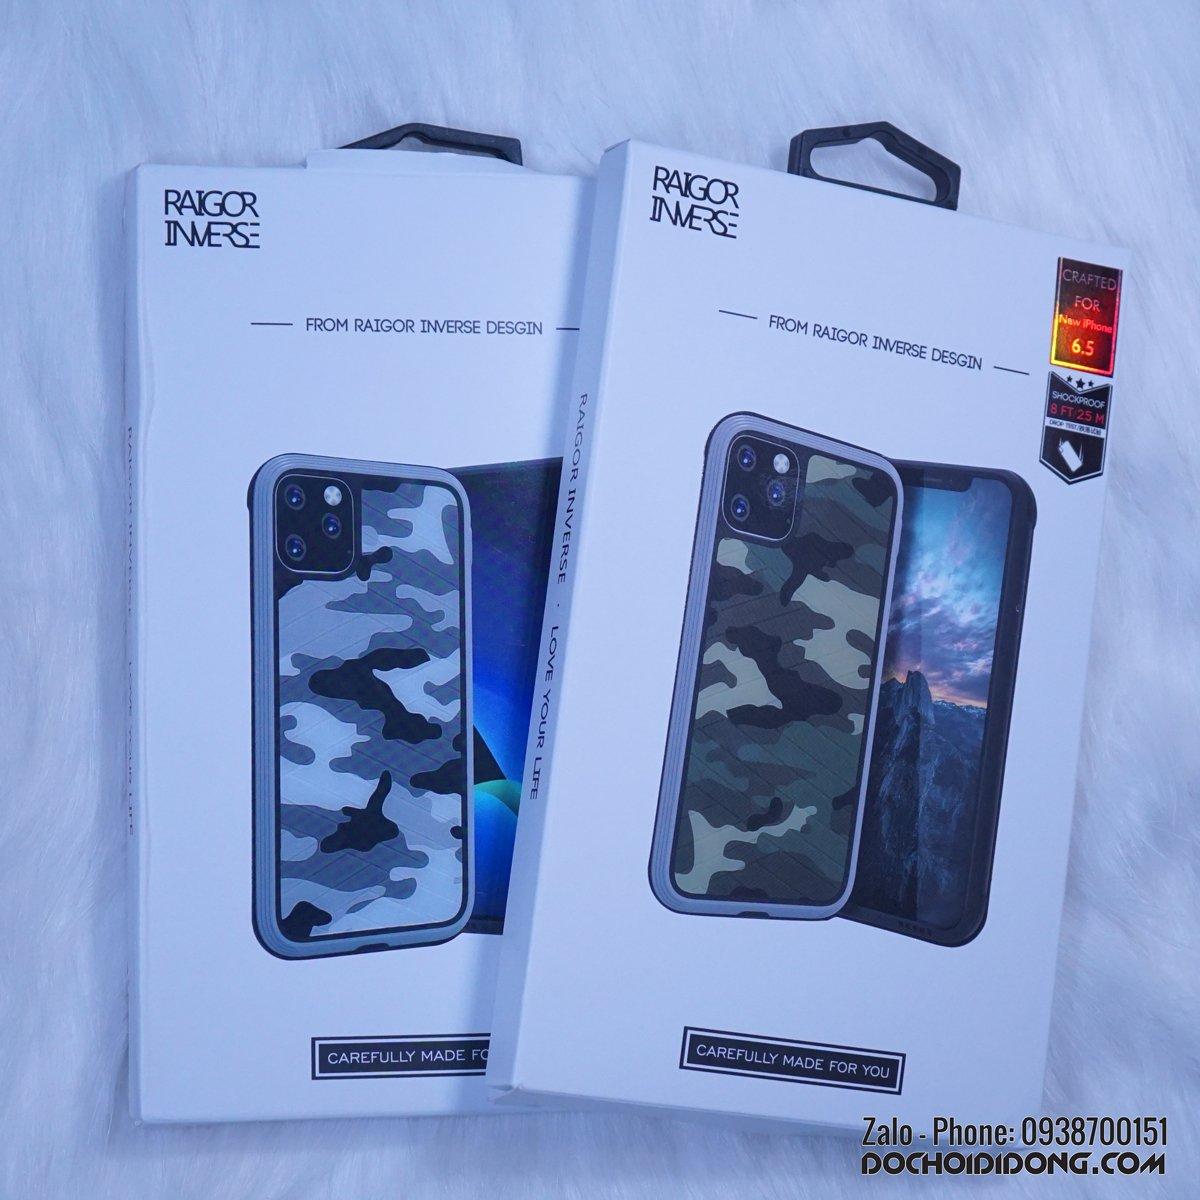 op-lung-iphone-11-pro-max-raigor-inverse-chong-soc-quan-doi